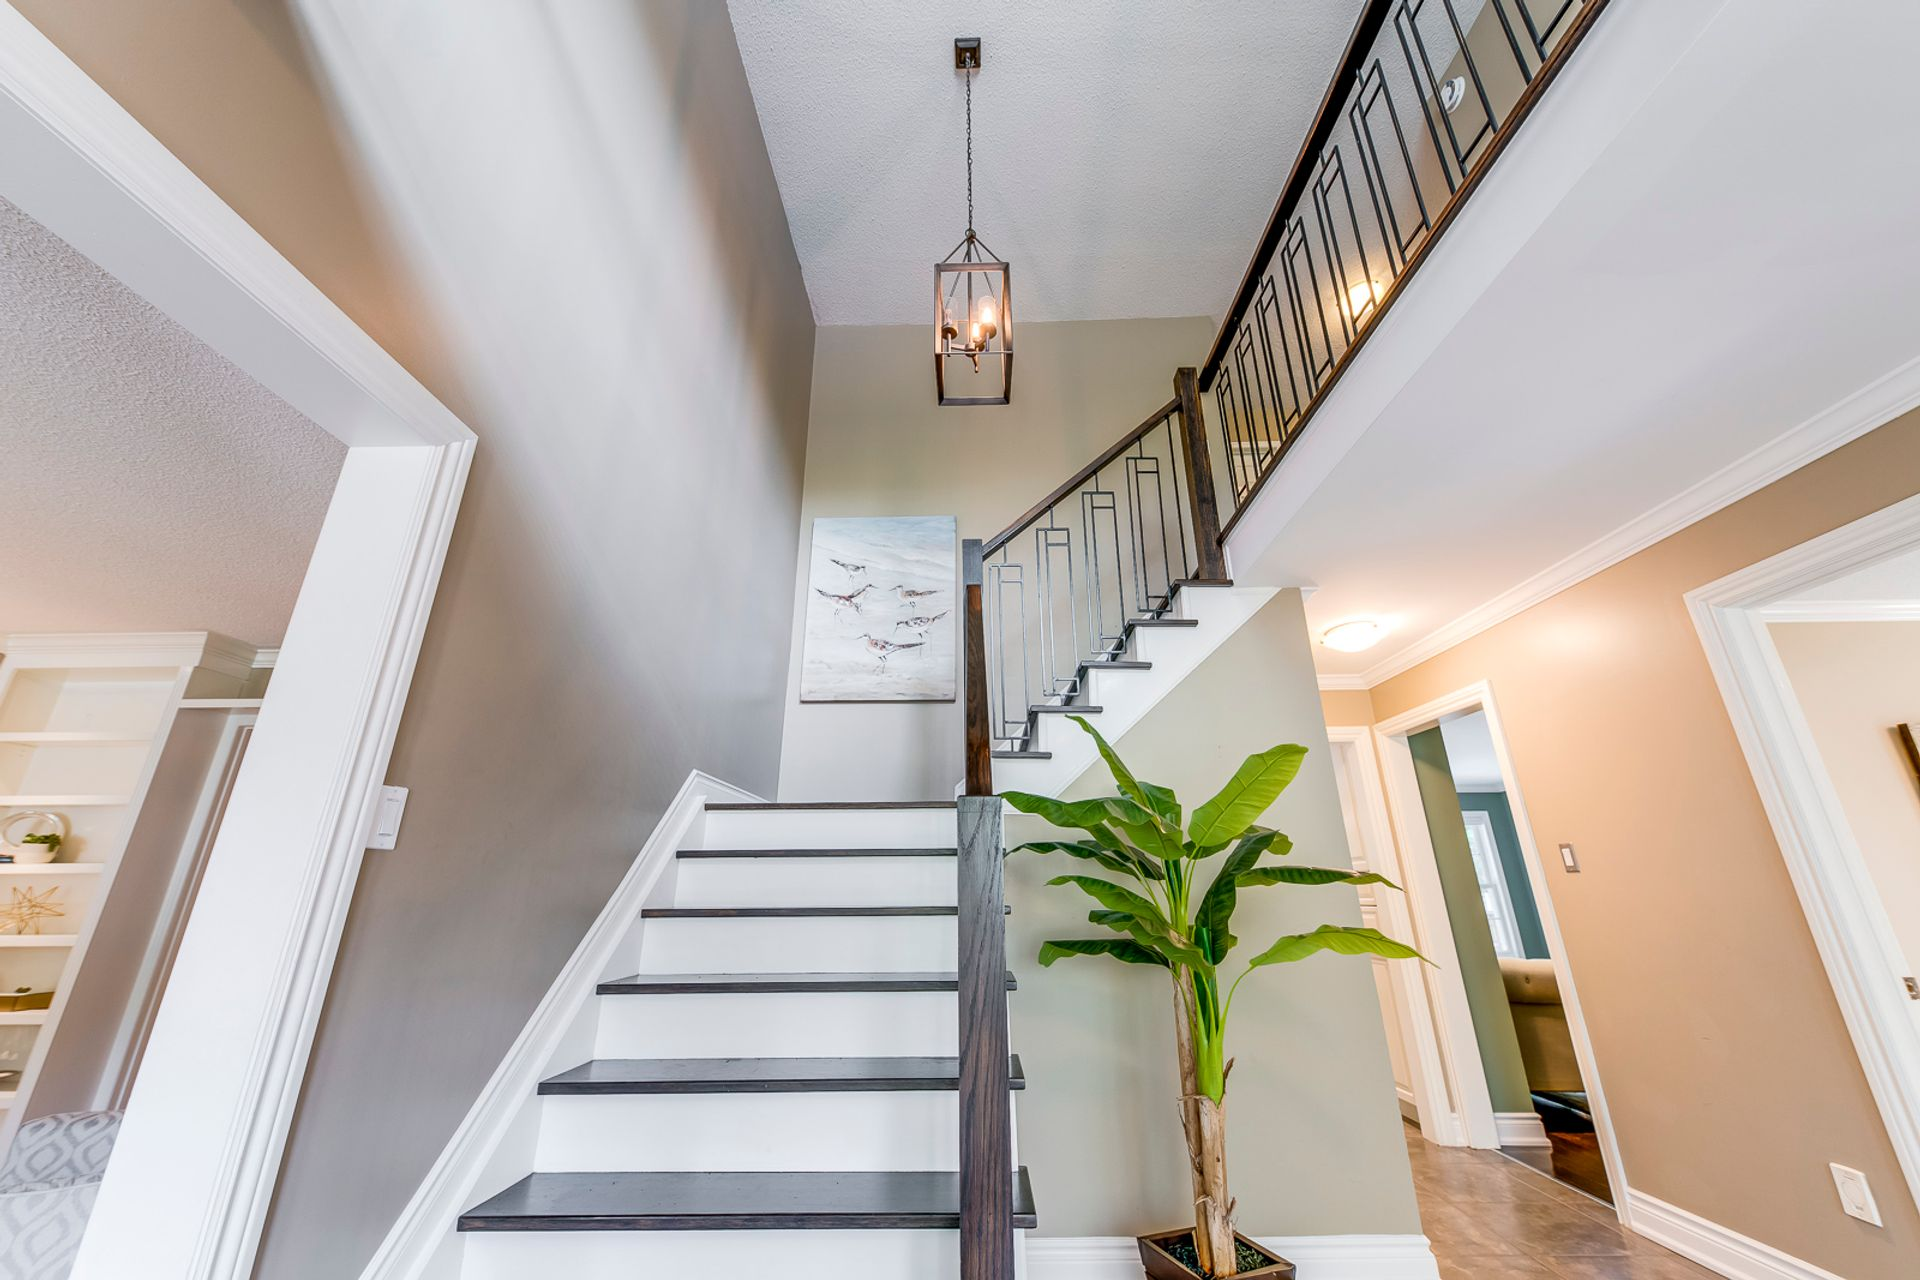 Stairs - 2180 Dunvegan Ave, Oakville - Elite3 & Team at 2180 Dunvegan Avenue, Eastlake, Oakville